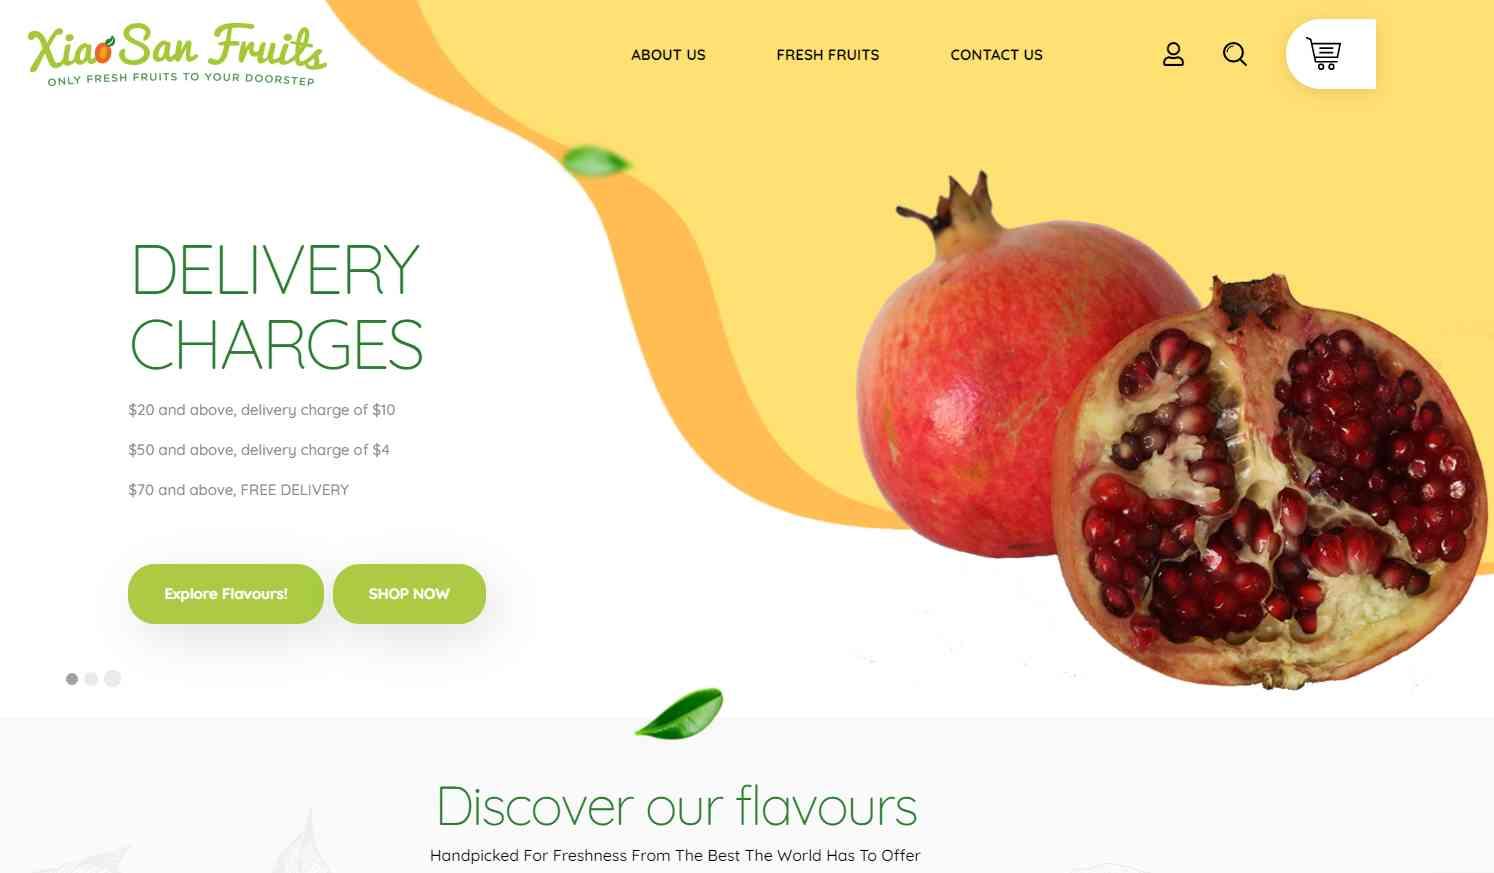 xiaosan fruits Top Juice Retailers in Singapore